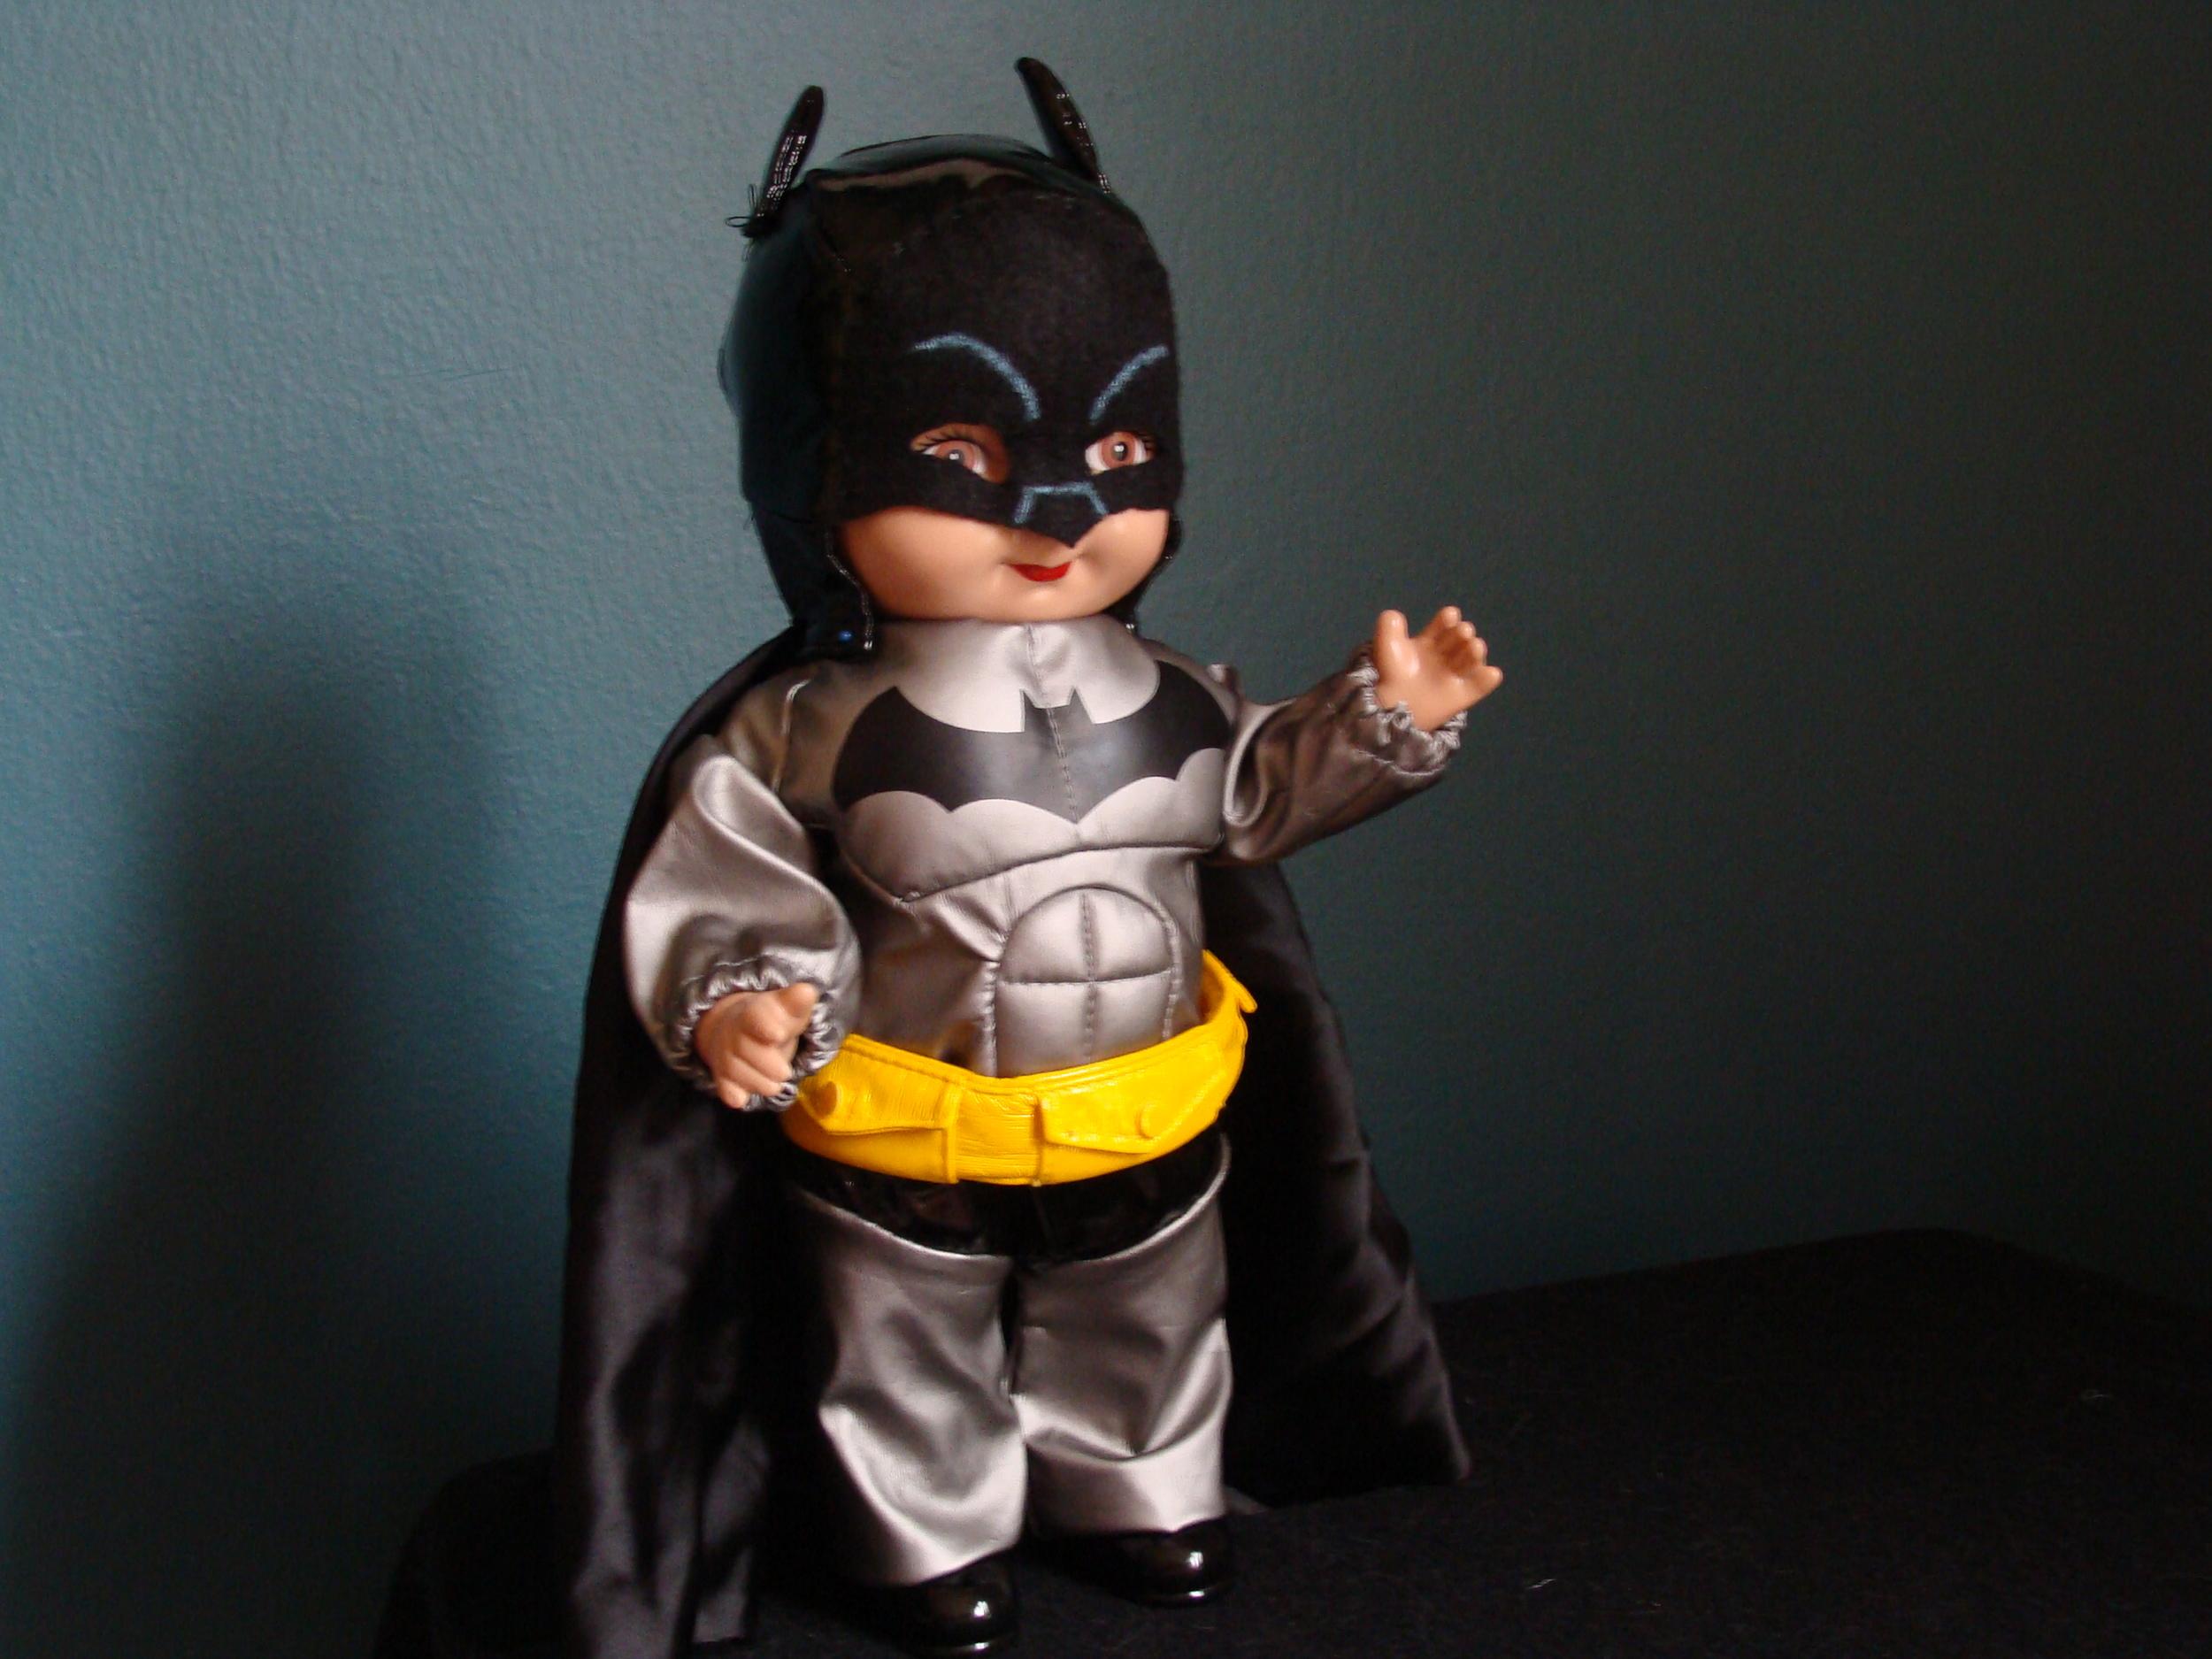 Buddy Ian as Batman